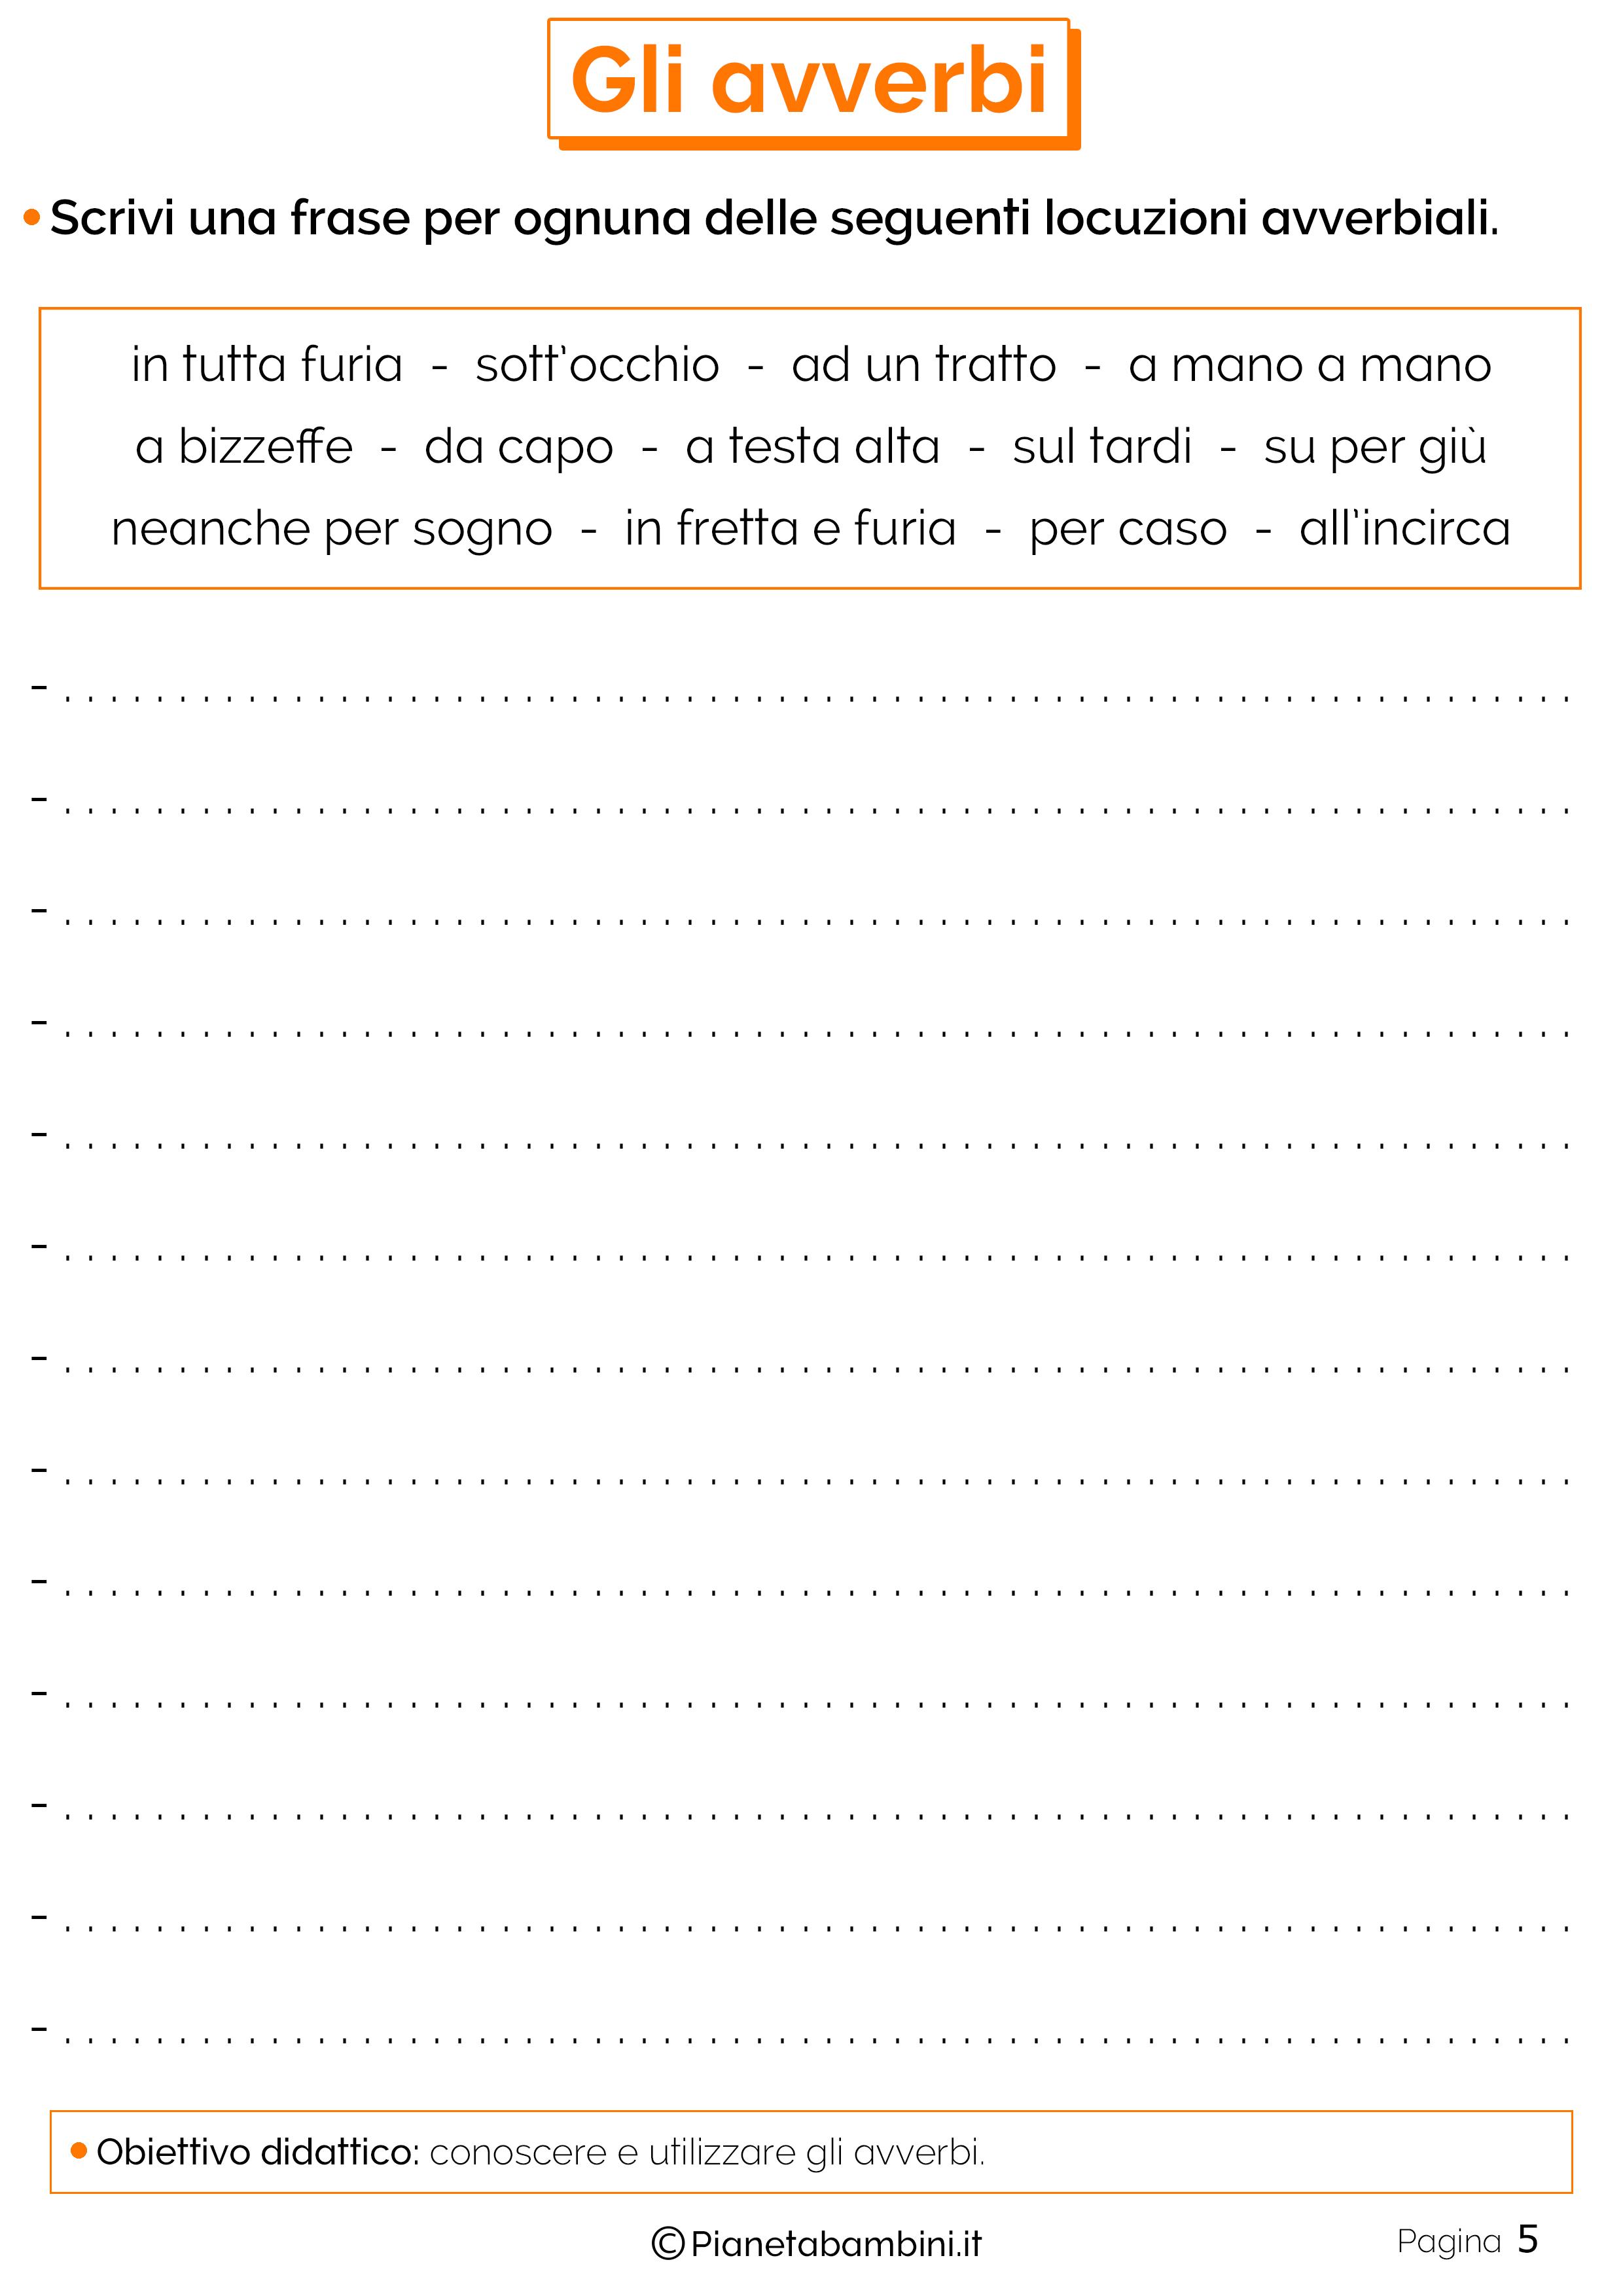 Esercizi sugli avverbi 5